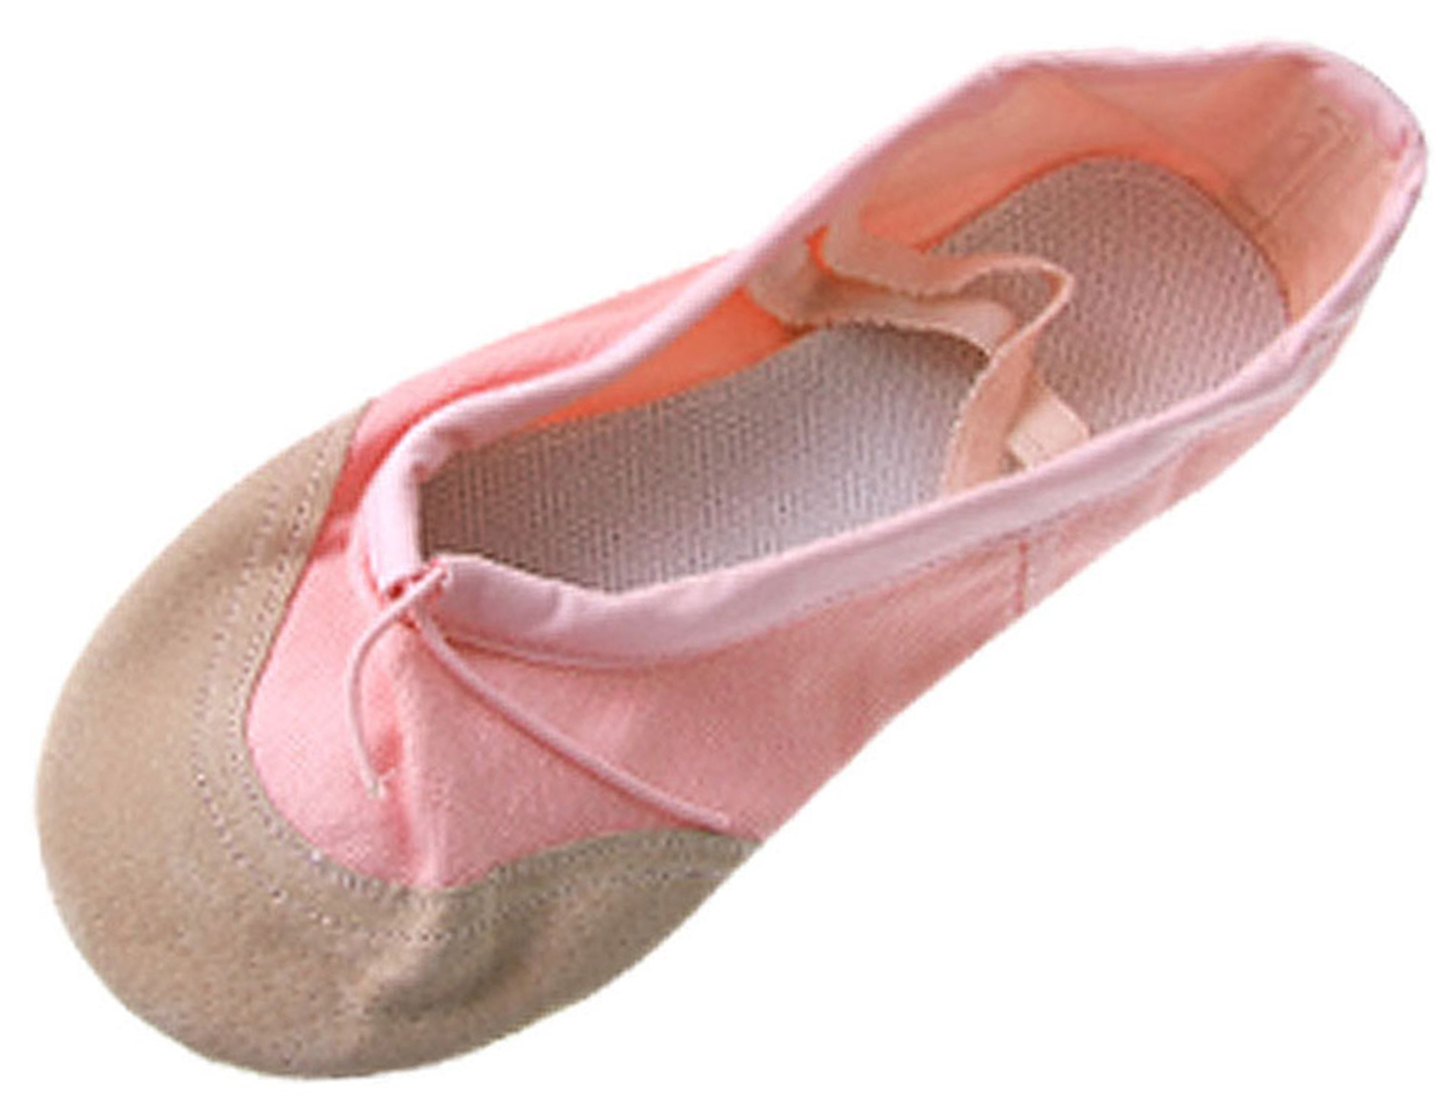 US Size 13 Girls Pink Canvas Dancing Ballet Flat Shoes